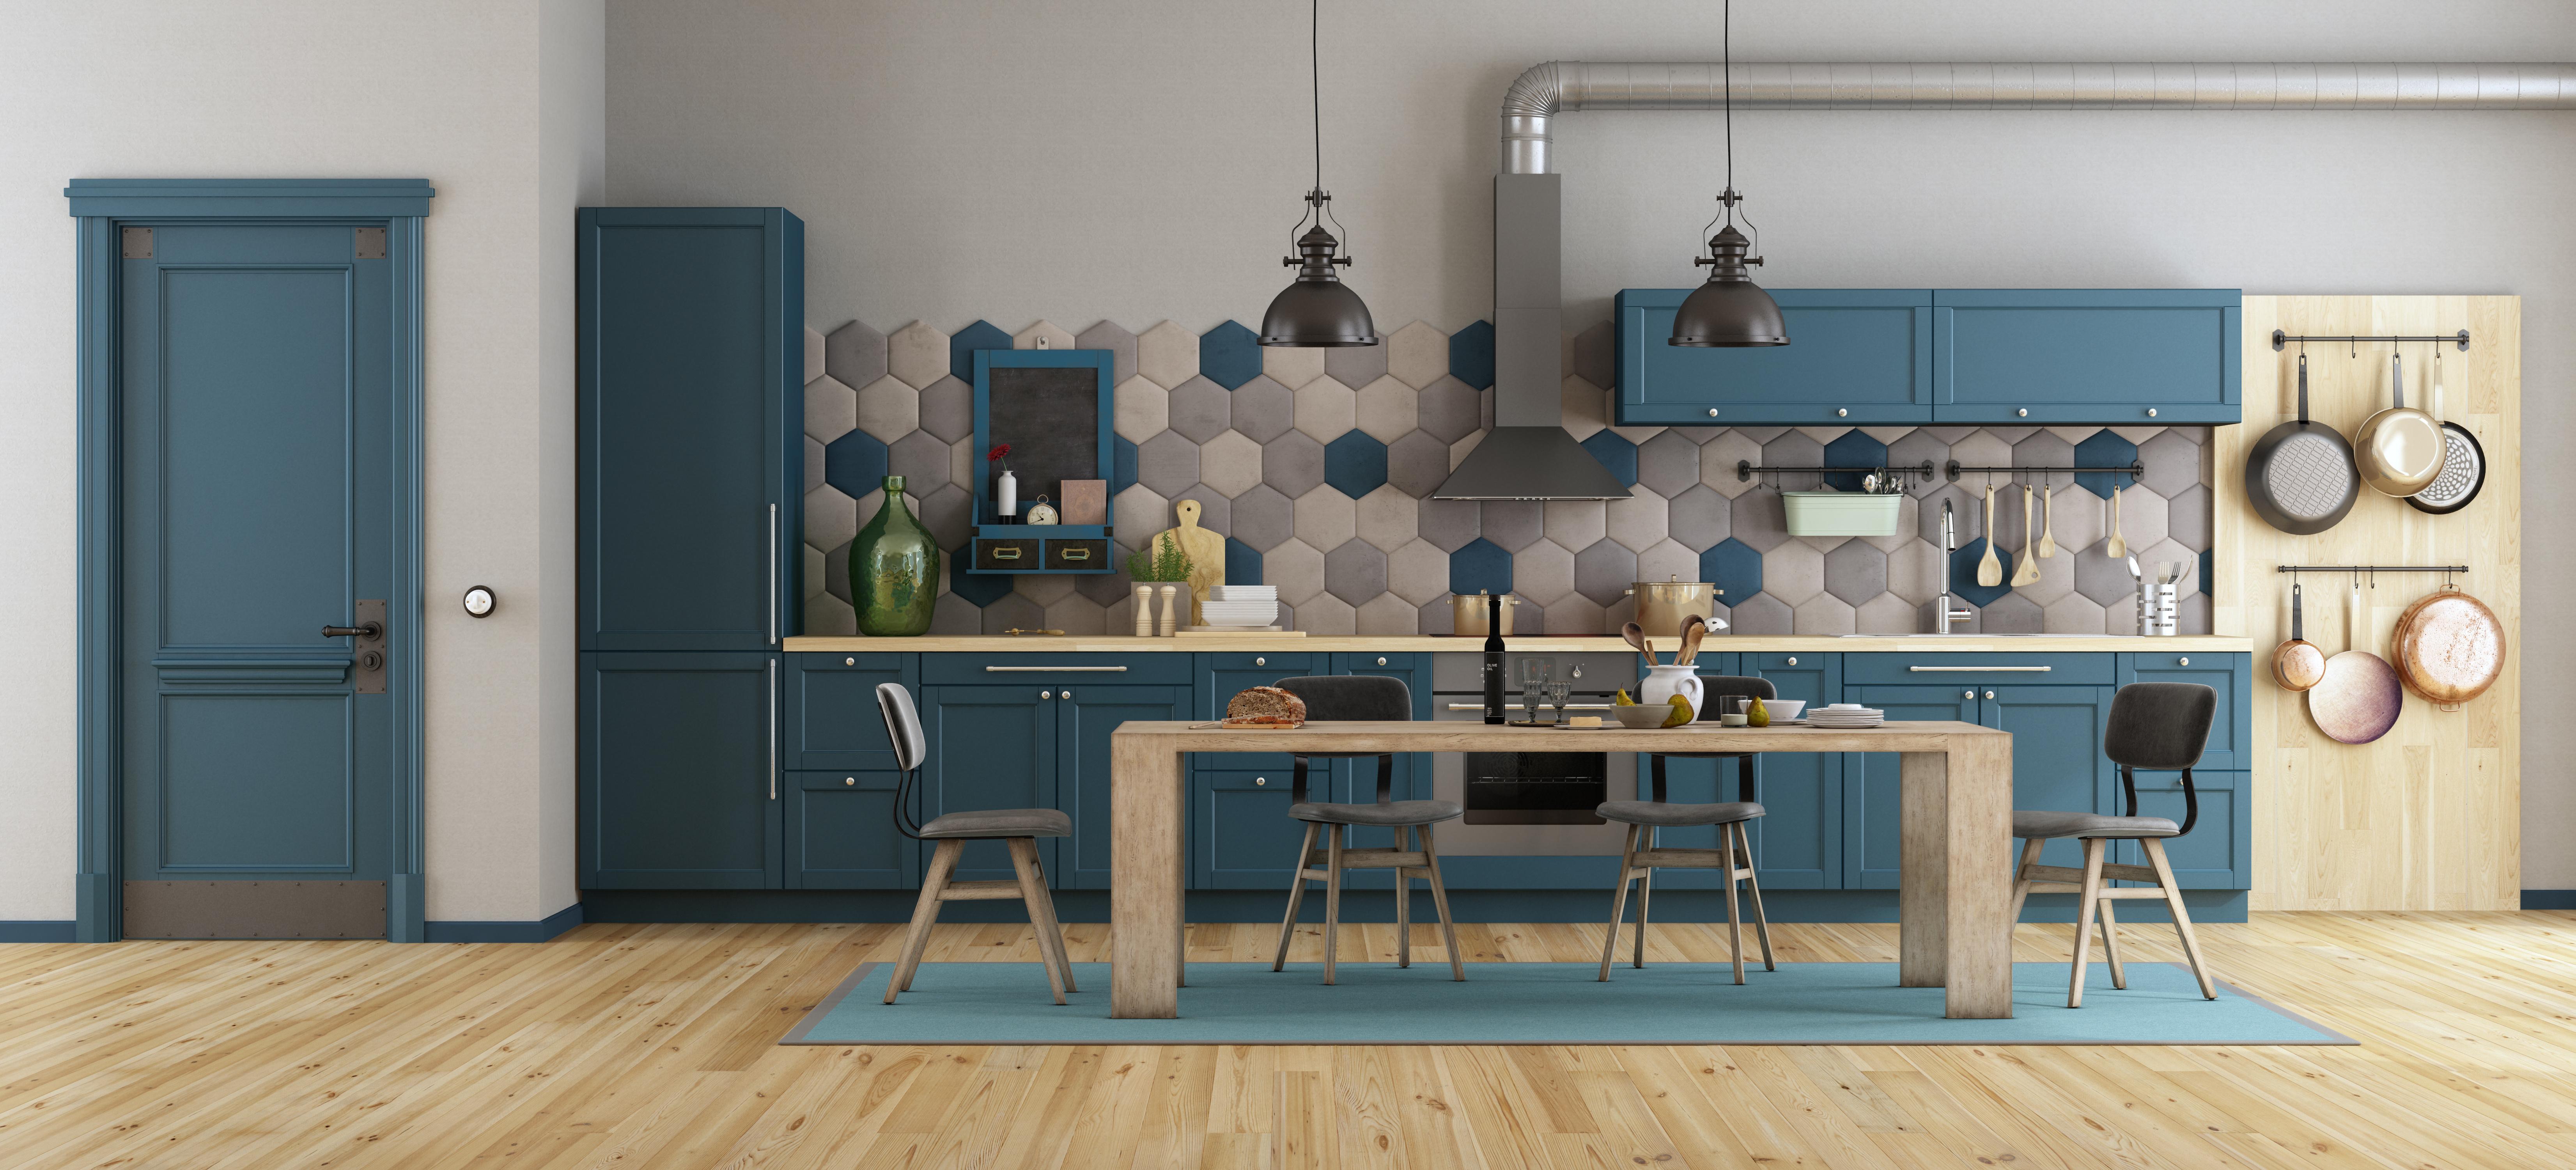 adobe-stock-blue-kitchen